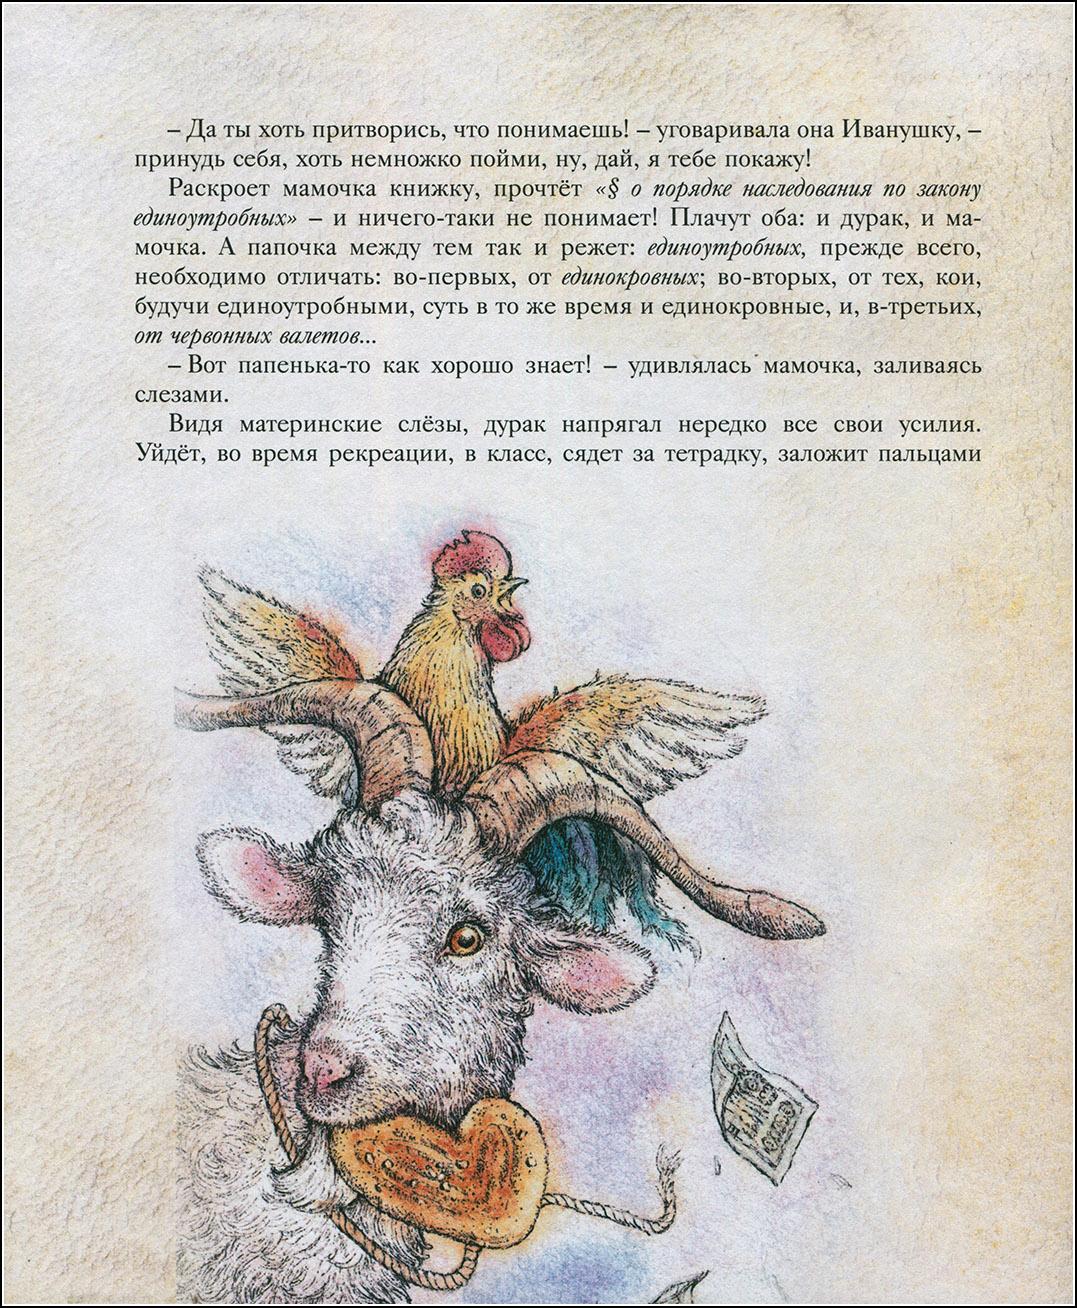 Василиса Коверзнева, М.Е. Салтыков-Щедрин, Премудрый пискарь